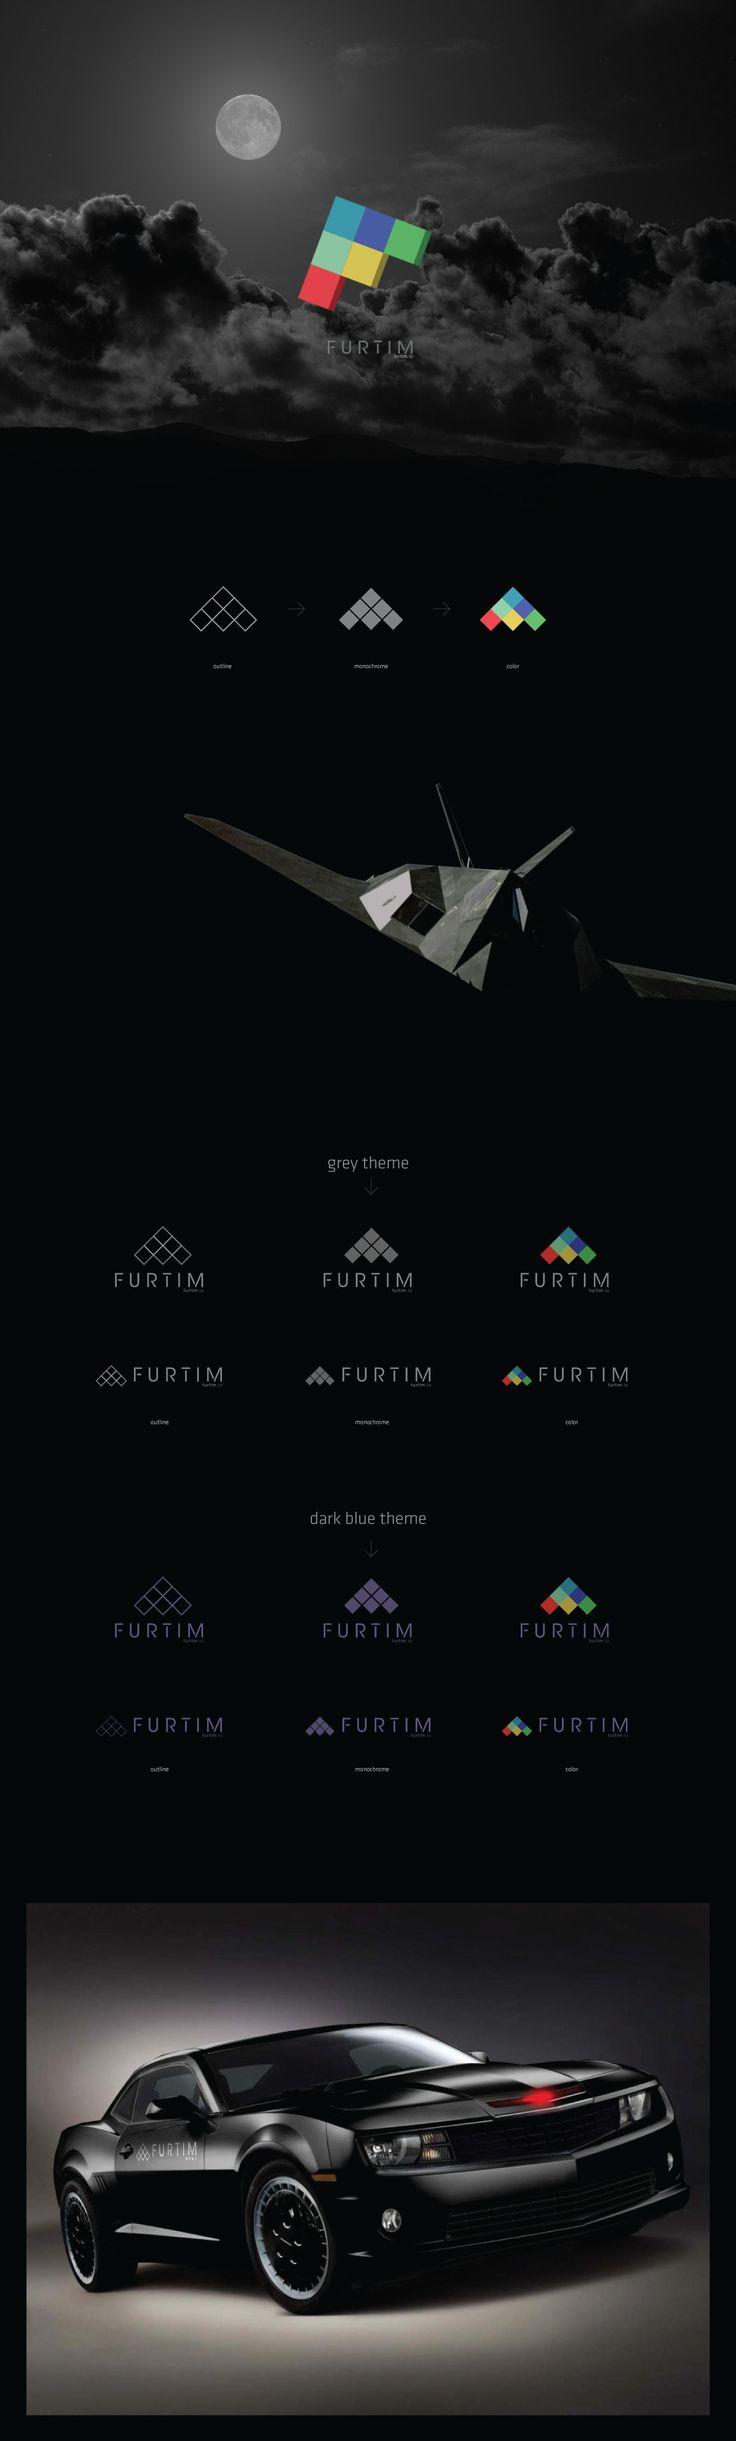 Drone, stealth logo design.